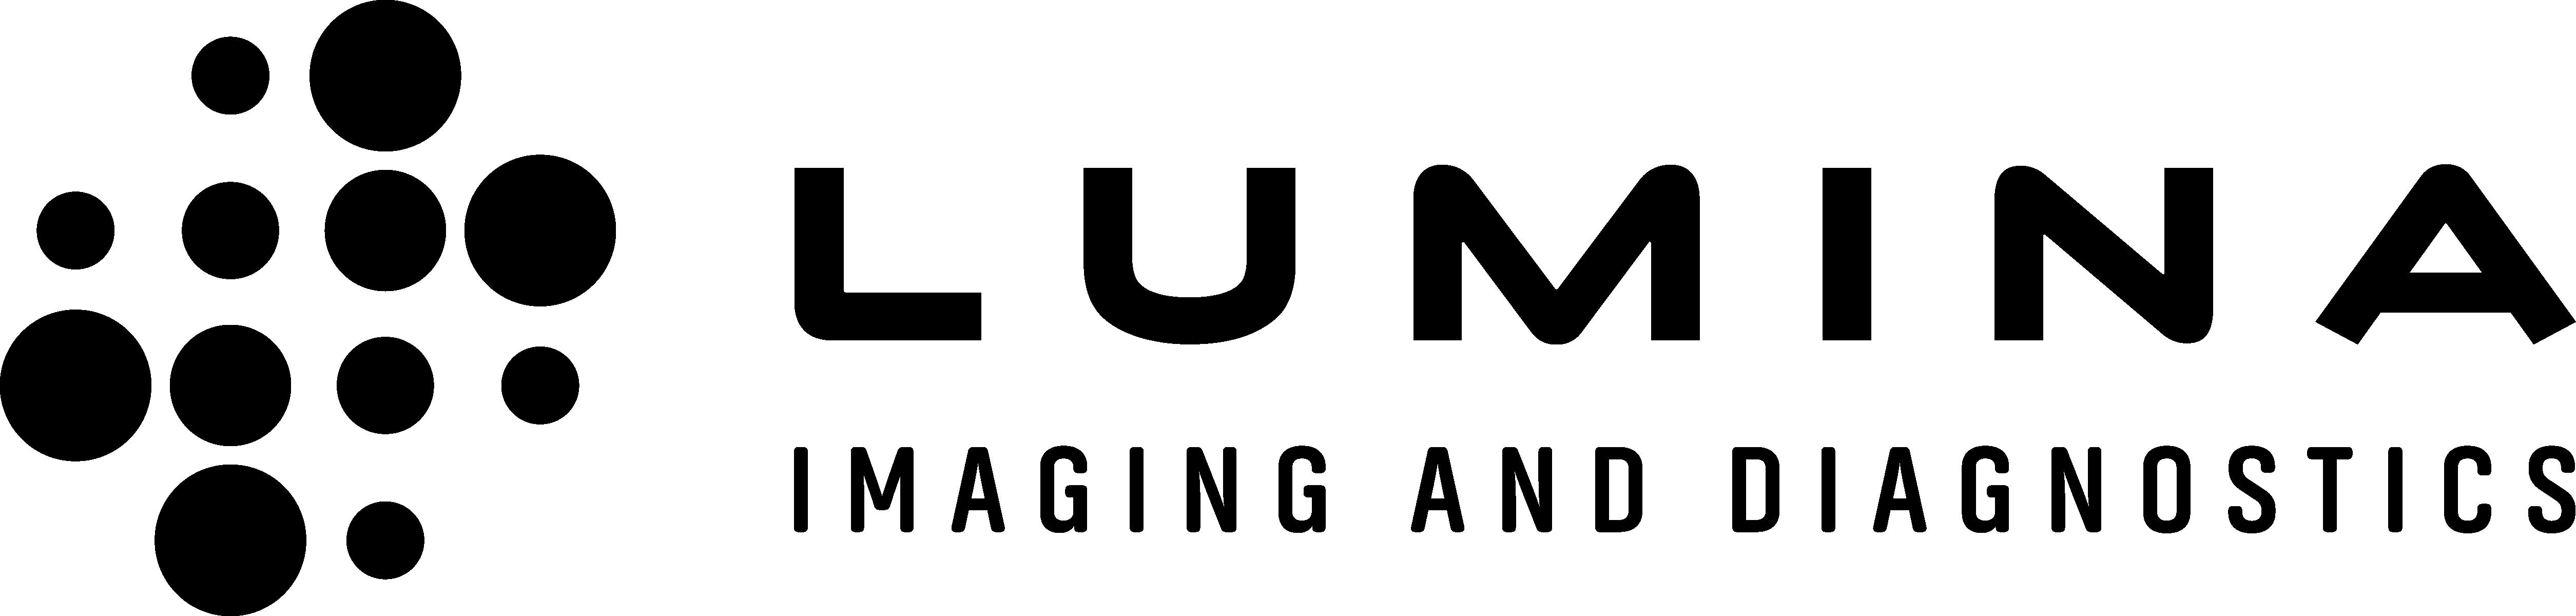 Lumina Medical Imaging and Diagnostics logo